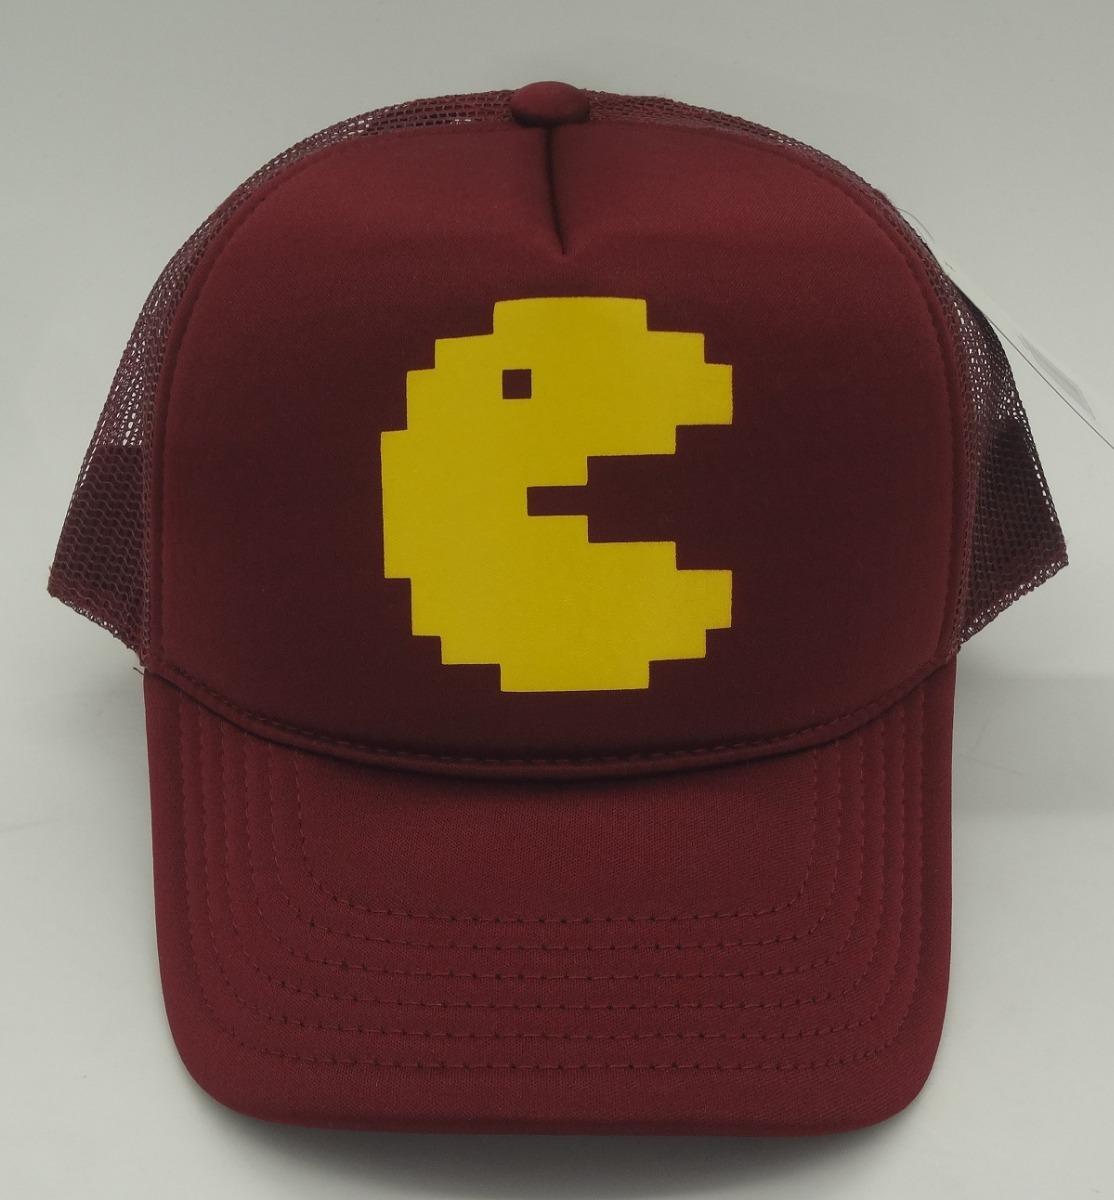 3b115561fa256 Boné Pac Man Tela Vinho Silk Pacman Atari Games Trucker Cap - R  46 ...